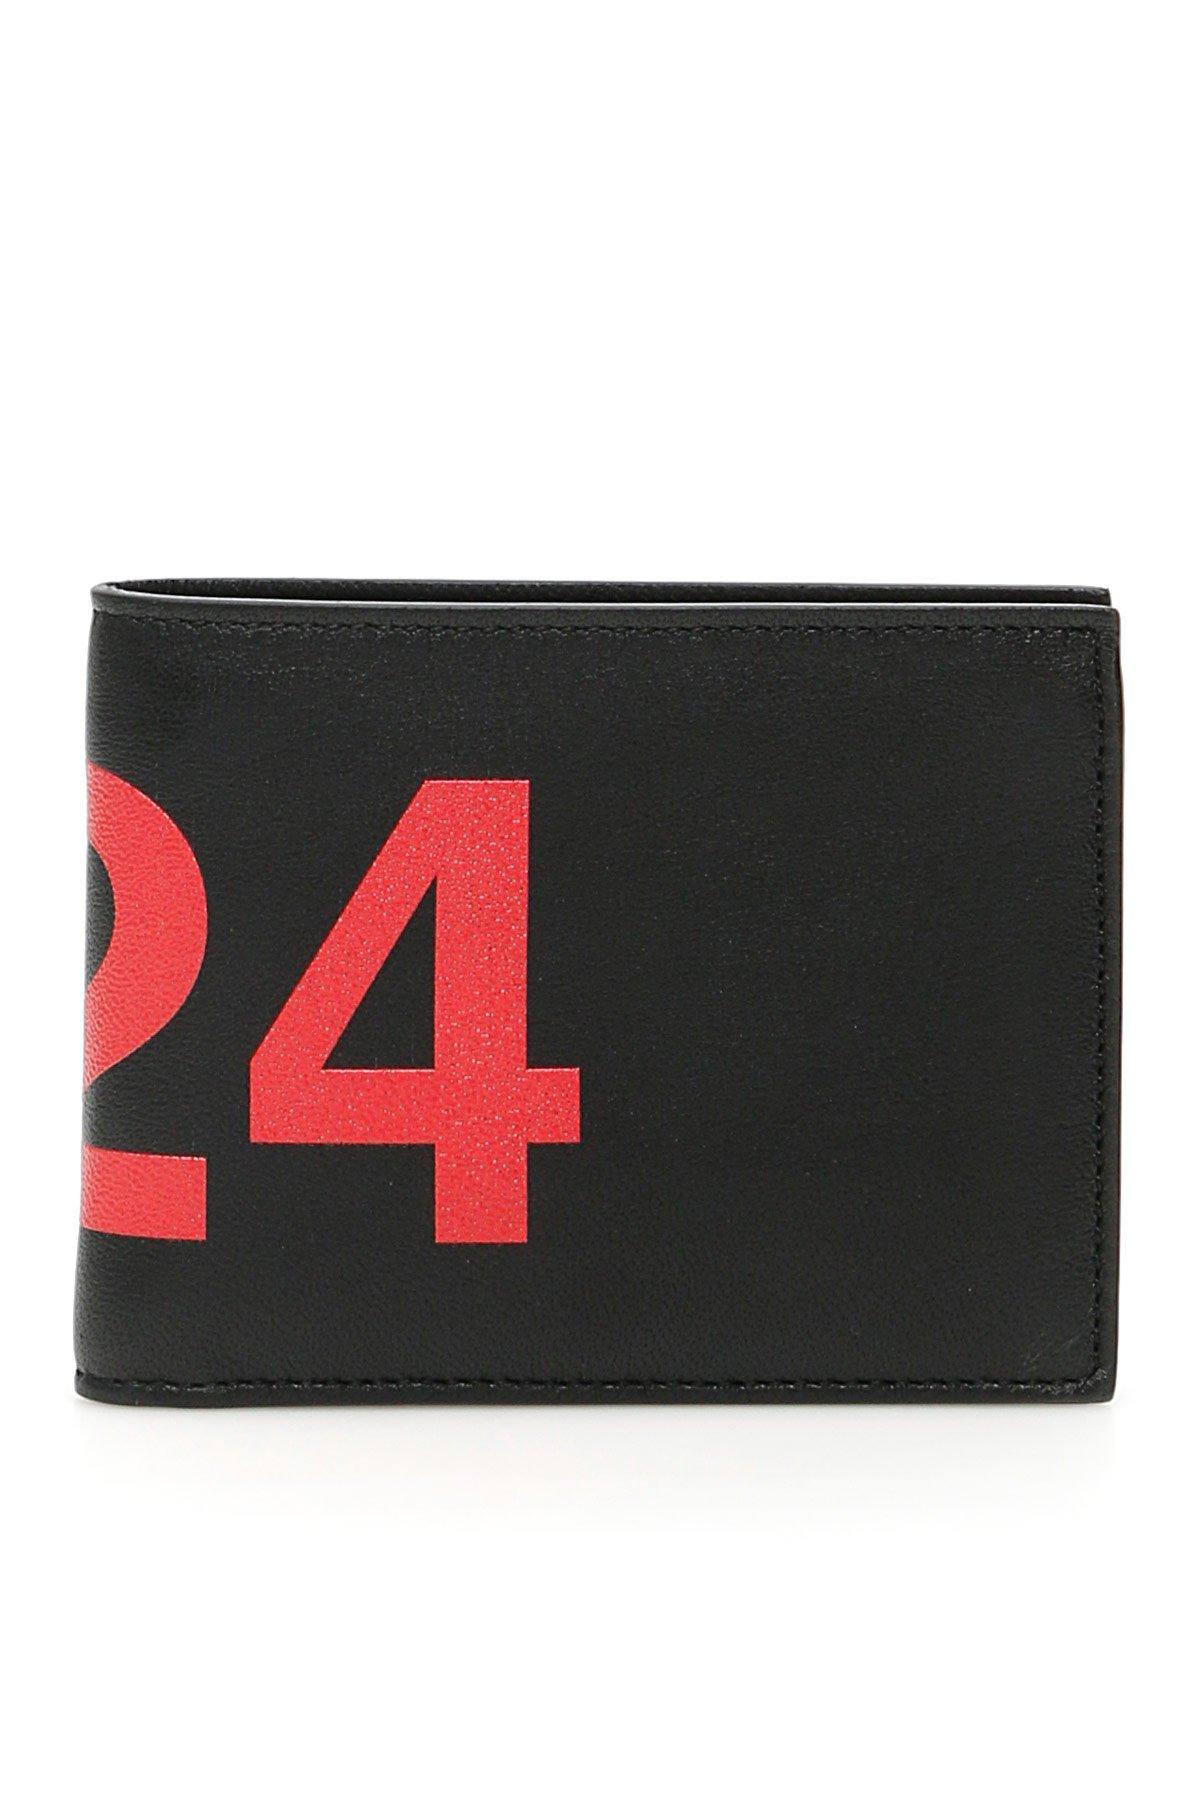 424 portafoglio bifold logo